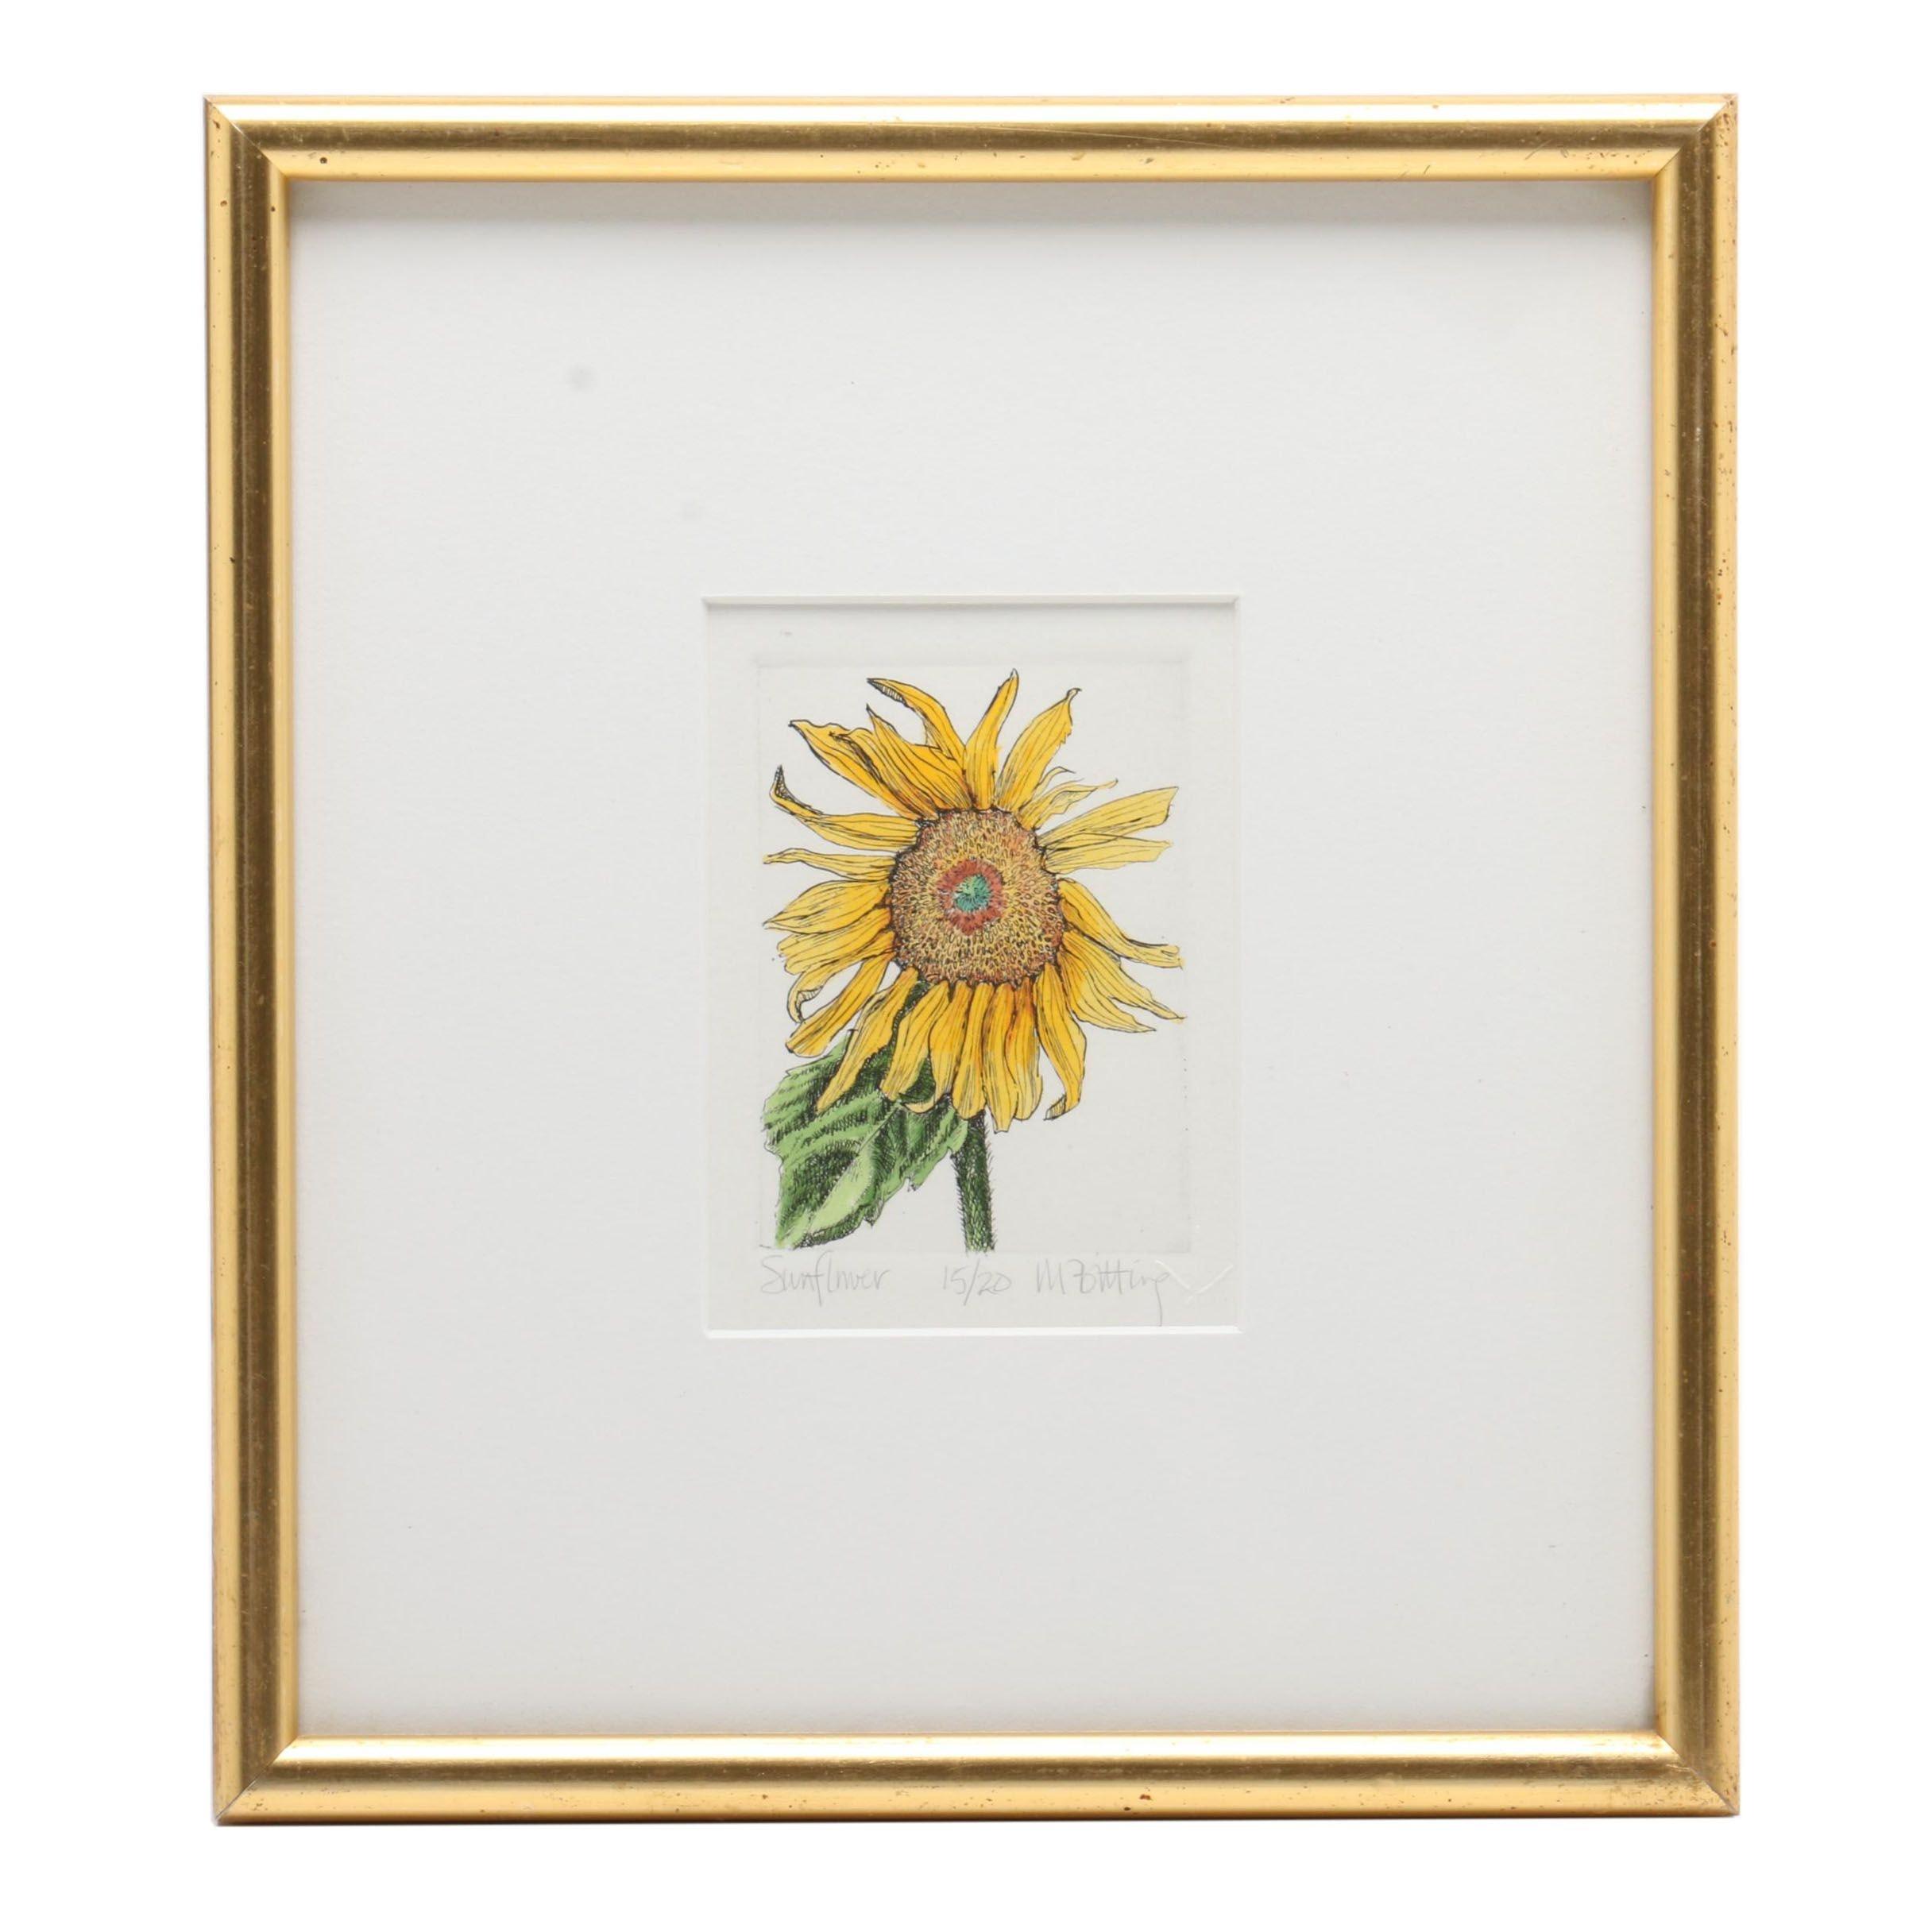 "Melinda Johns Bitting Hand-Colored Etching ""Sunflower"""